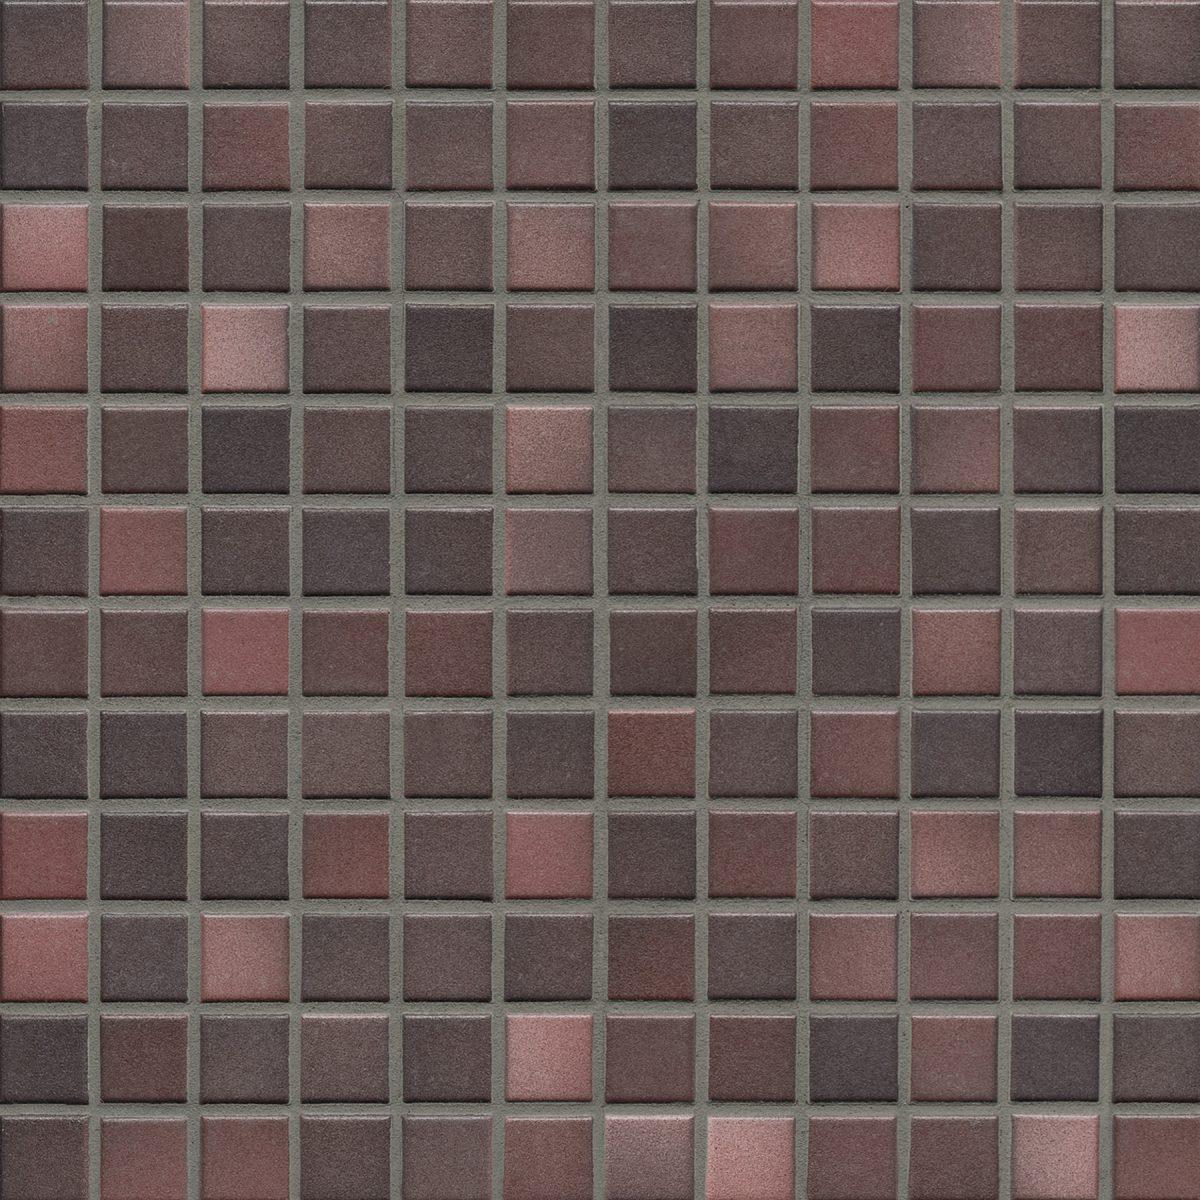 Мозаика серия Fresh 2,4 X 2,4 см Mystic Red Mix Secura (противоскользящая R10/B)